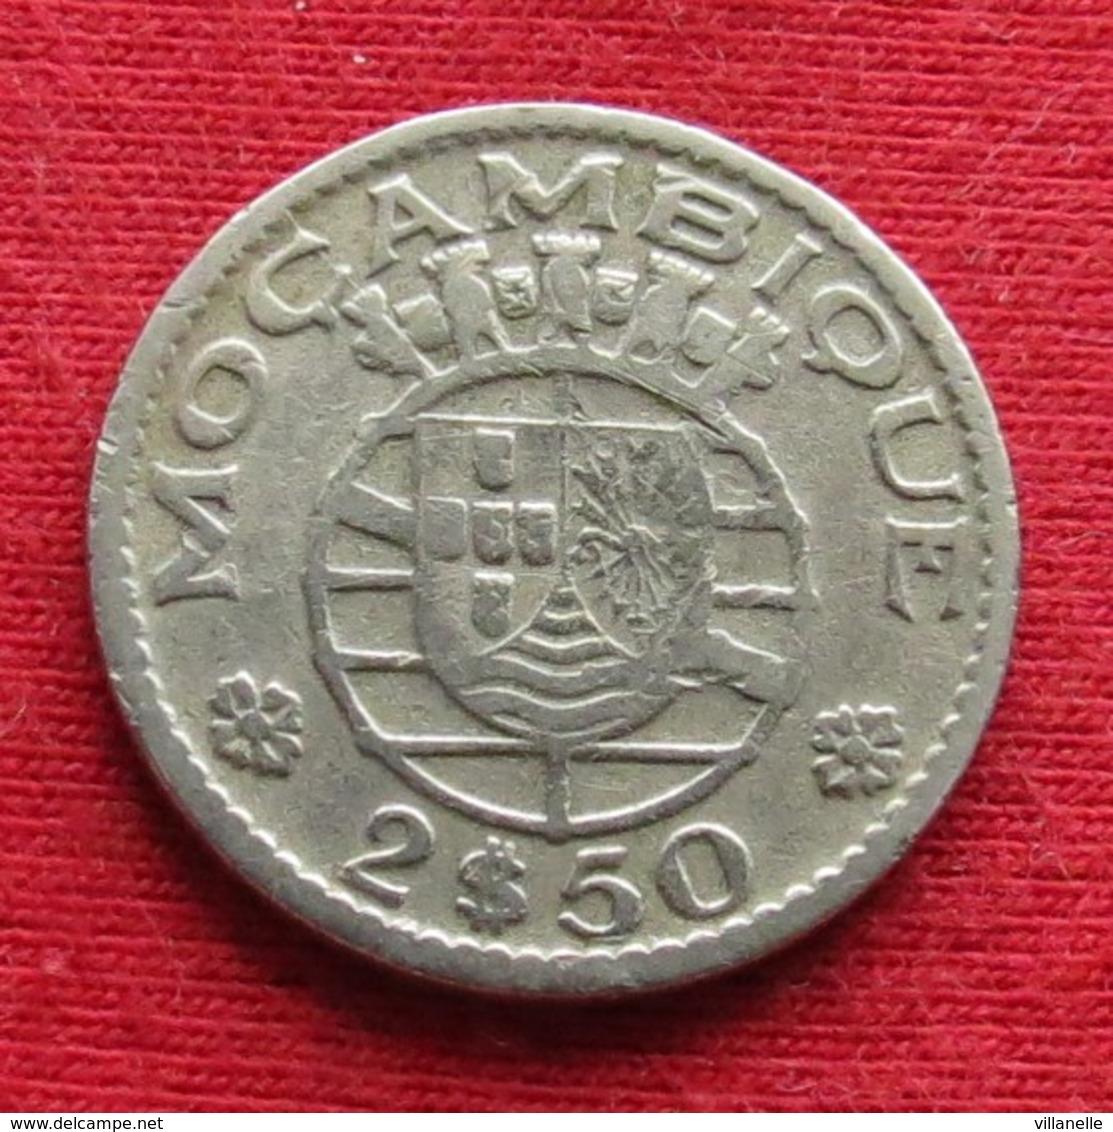 Mozambique 2.50 Escudo 1954 Mozambico Moçambique Wº - Mozambique